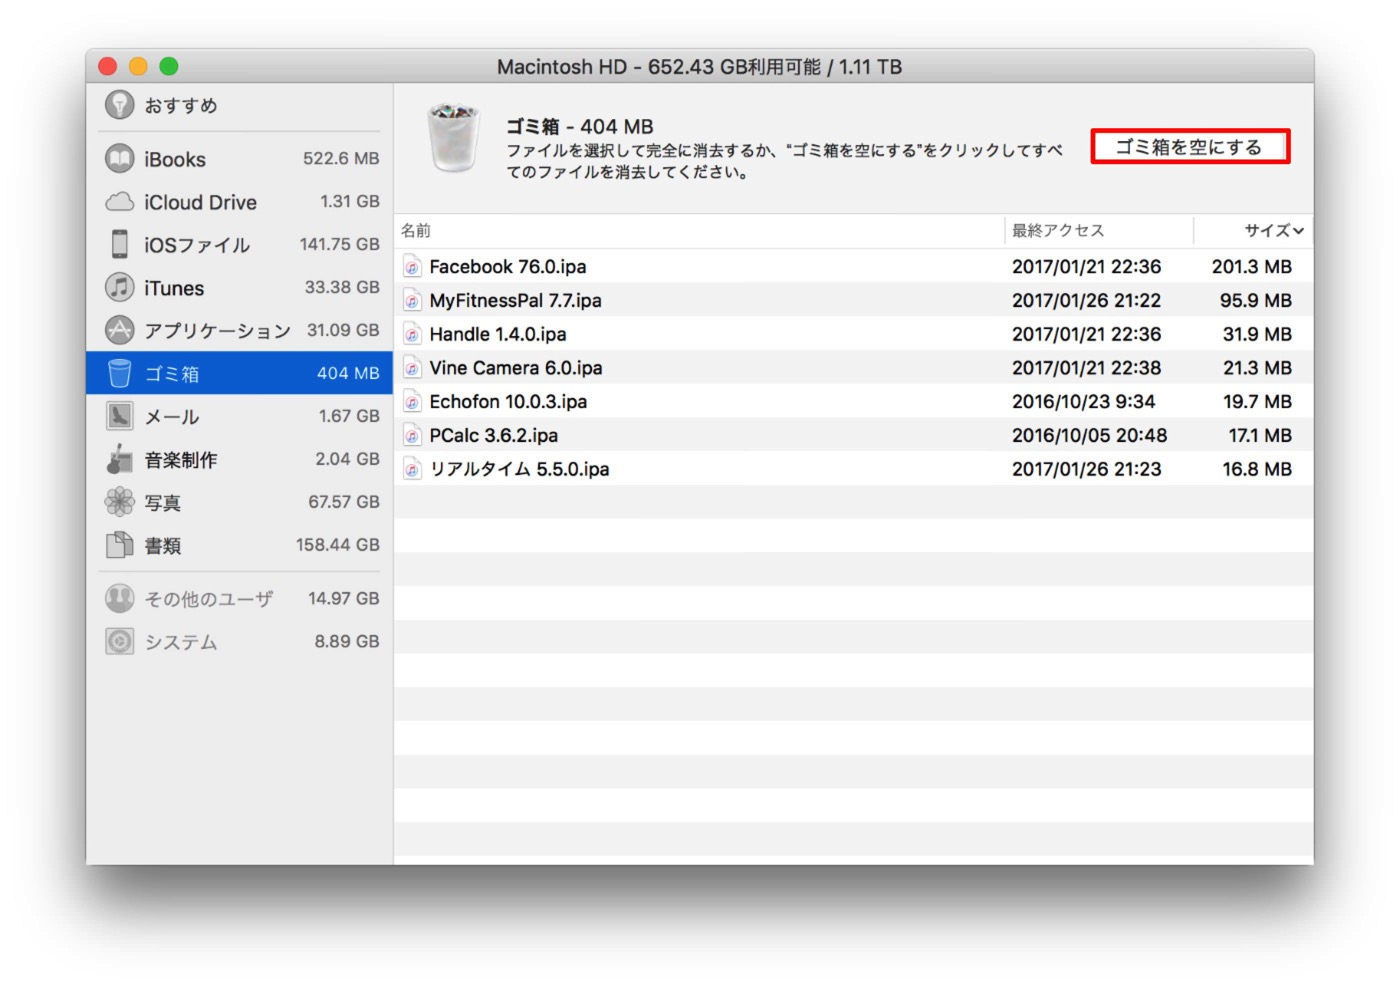 iMac 5K Retinaディスプレイモデル 管理画面-2